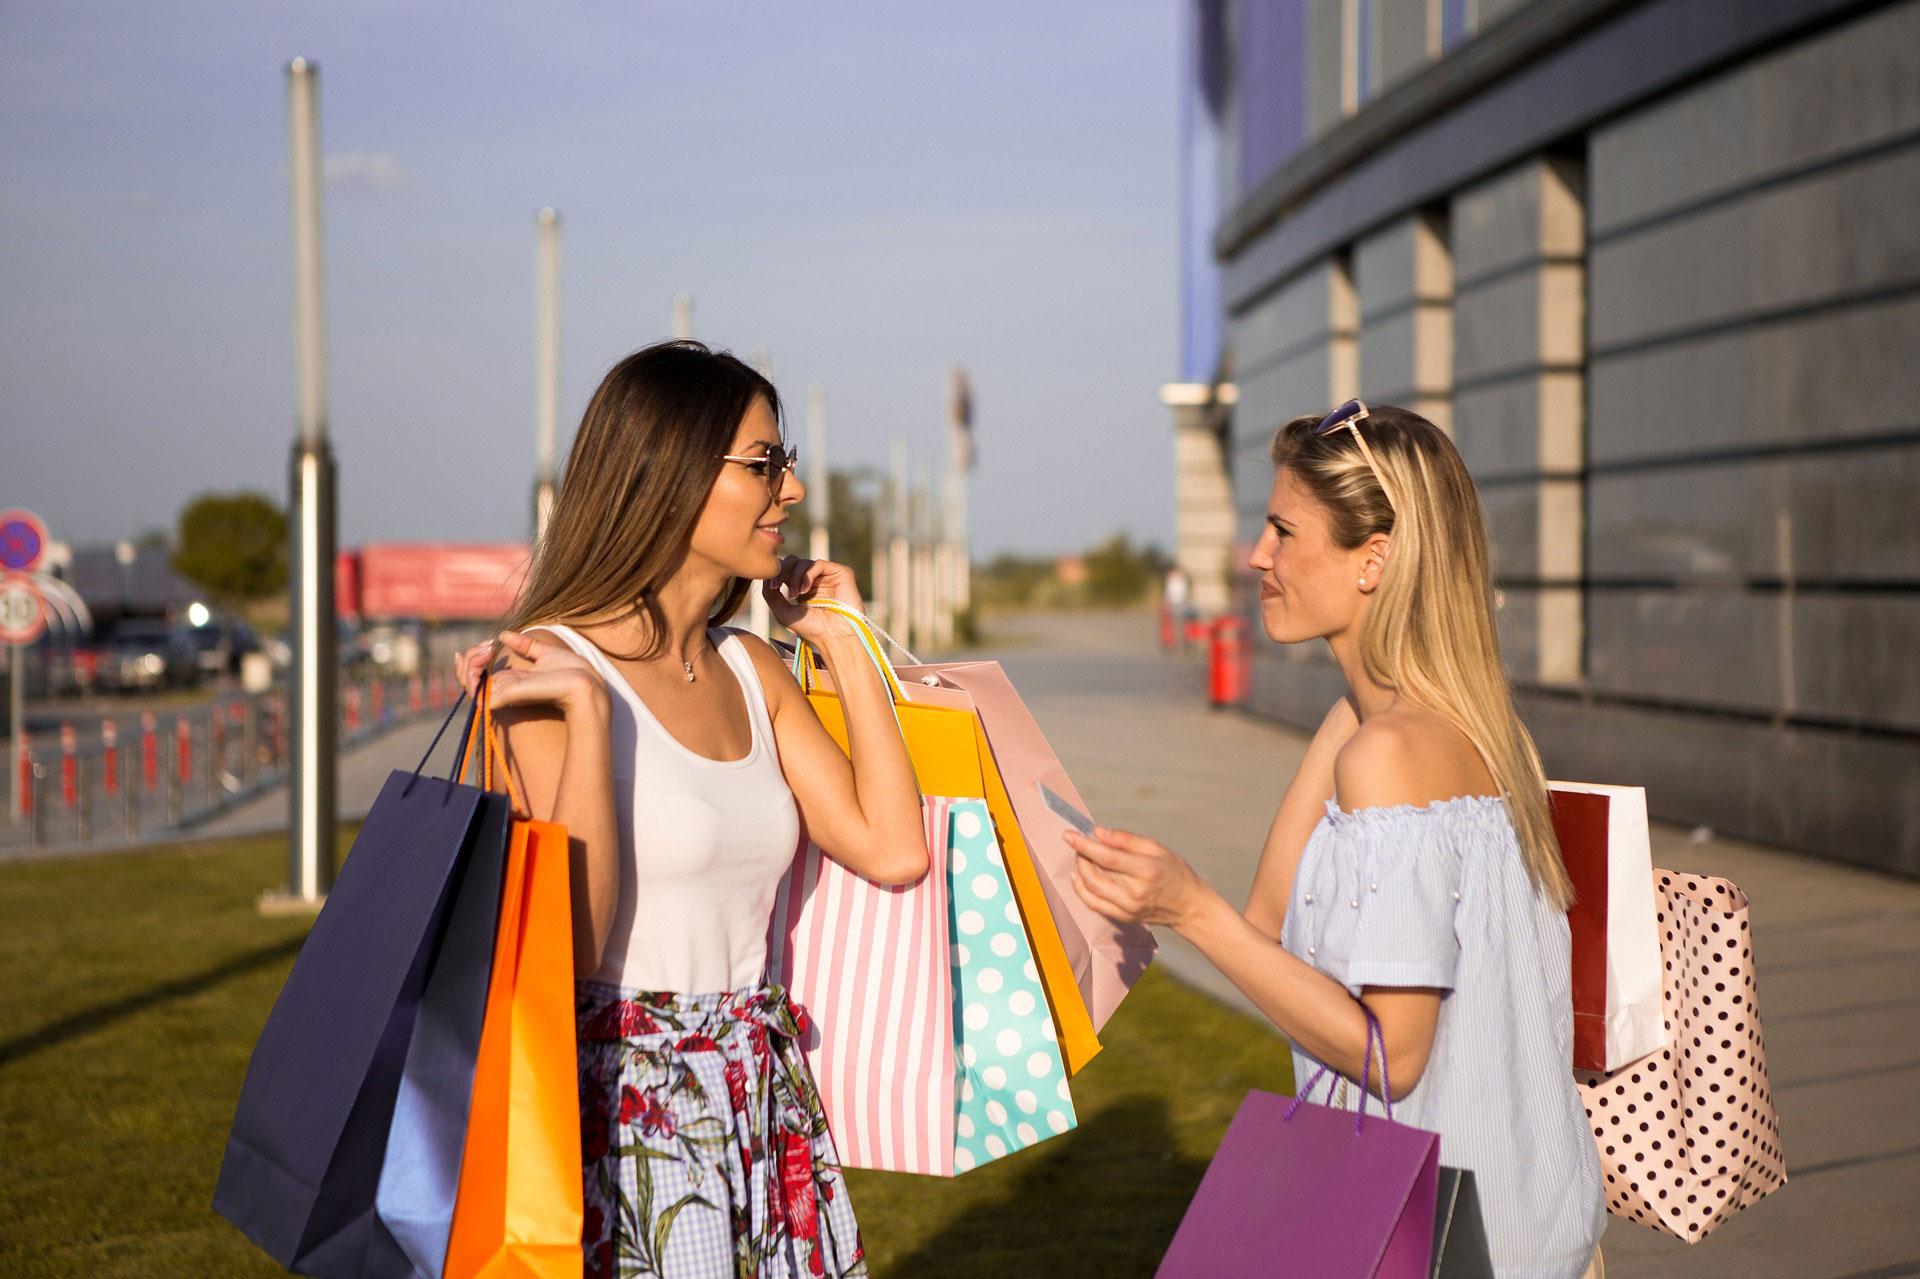 Two happy female friends shopping outside